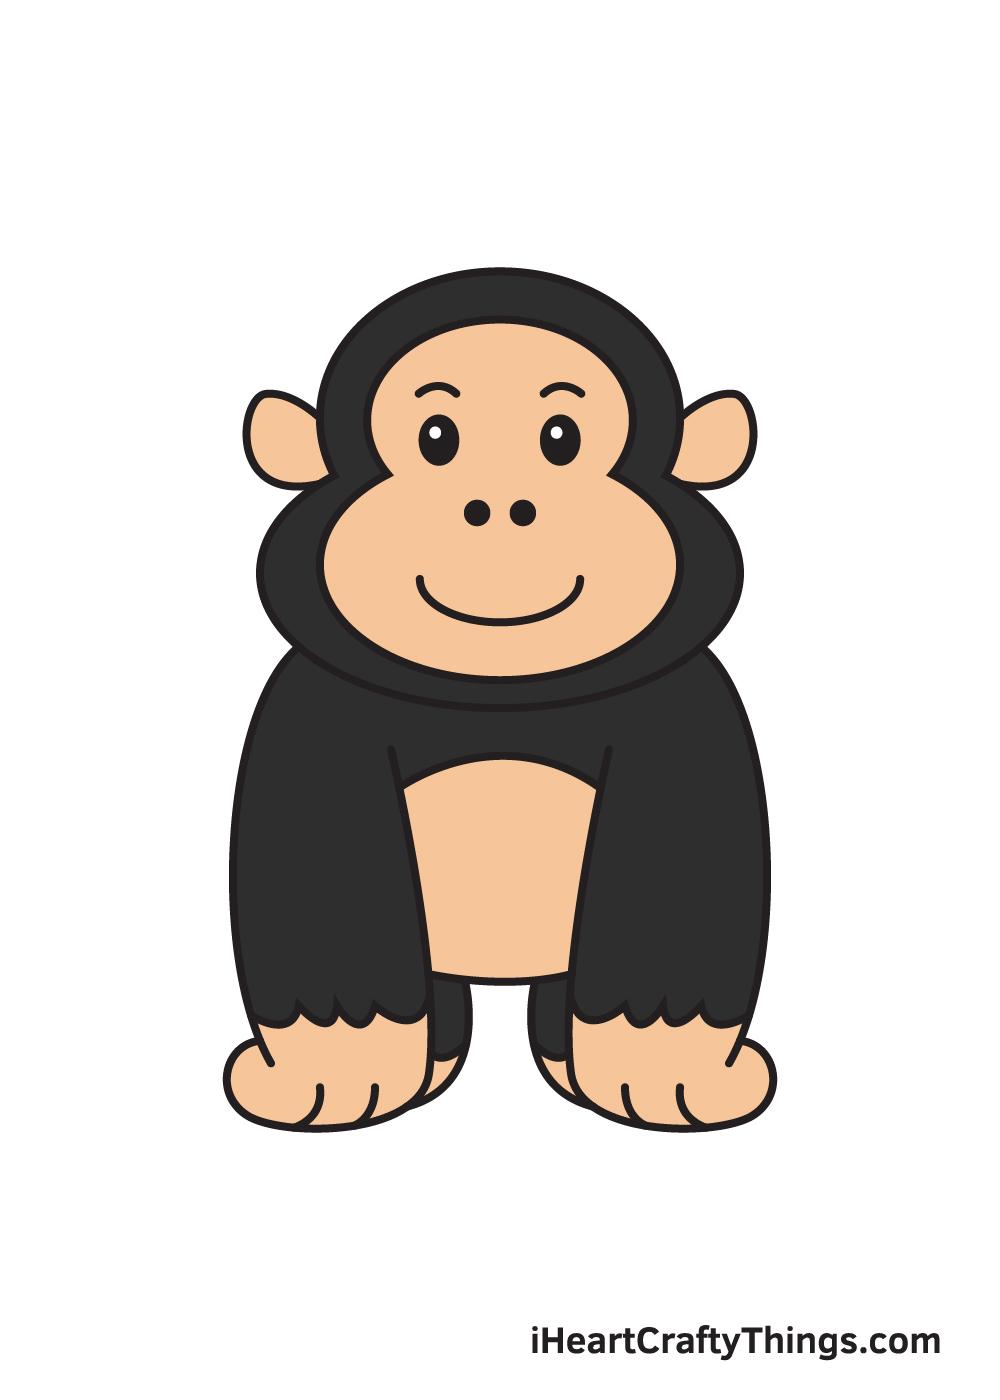 gorilla drawing - 9 steps